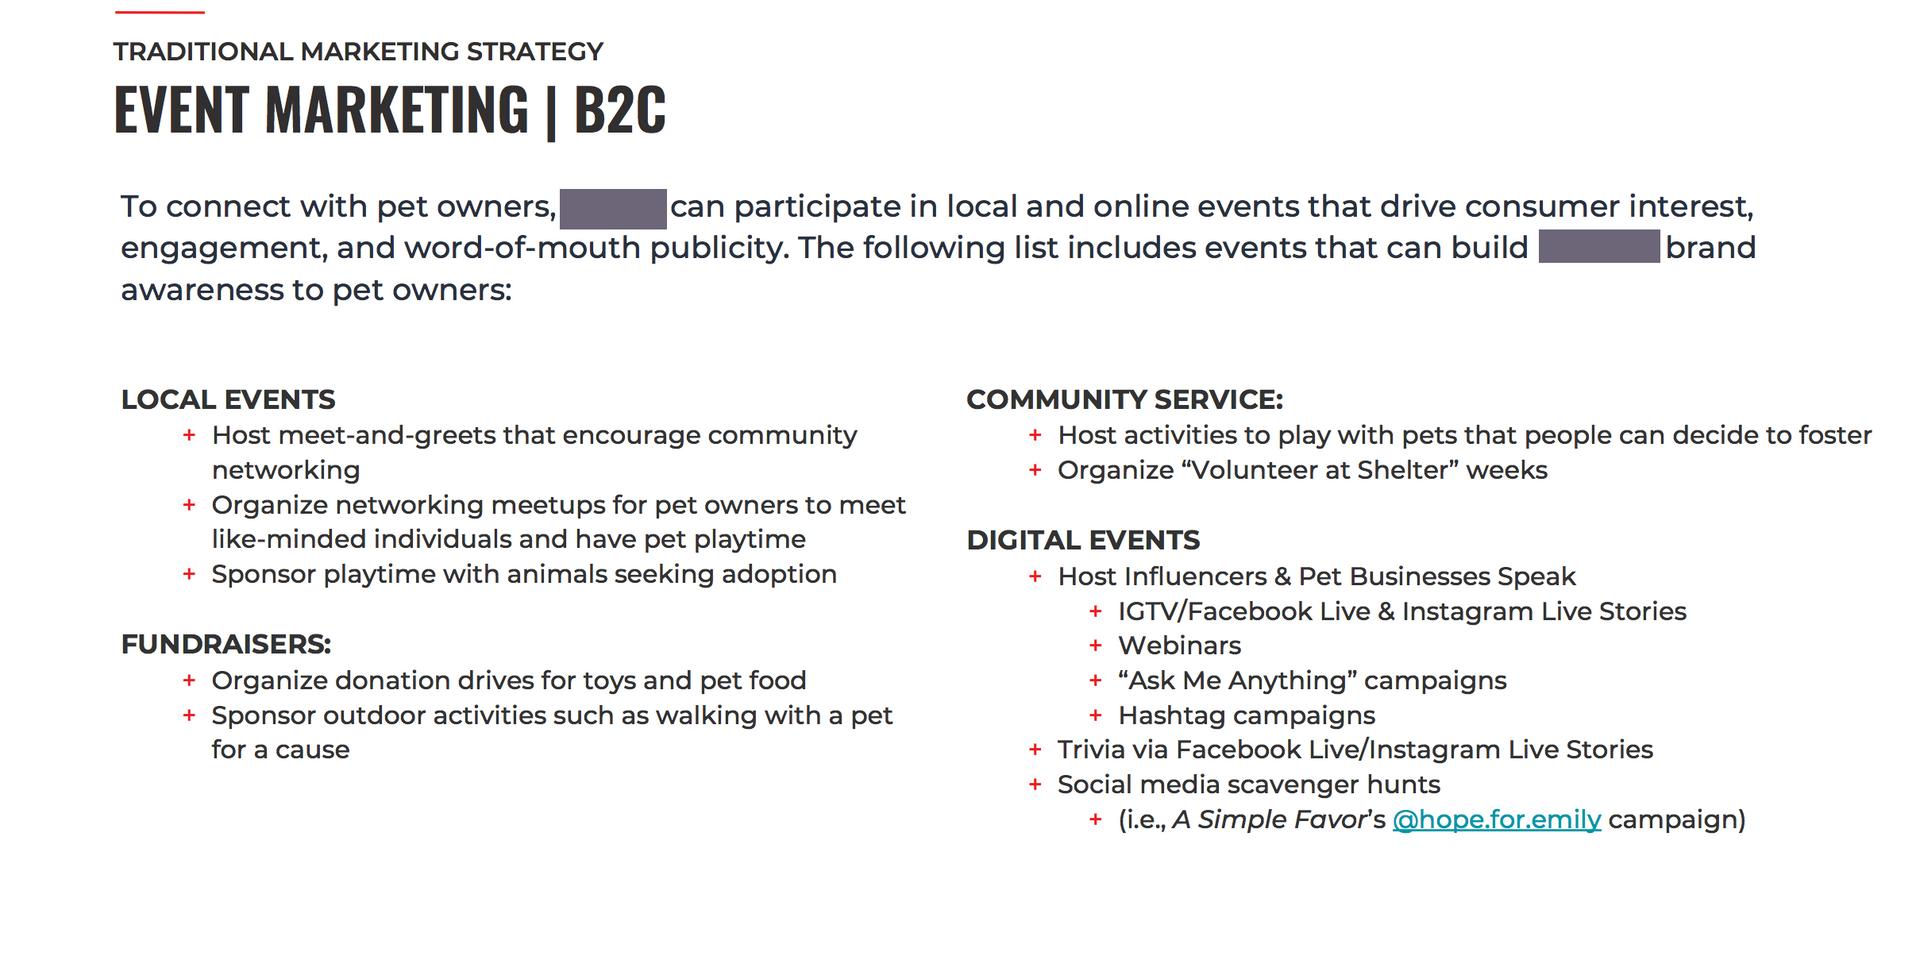 EventMarketingB2C_PetApp01.png